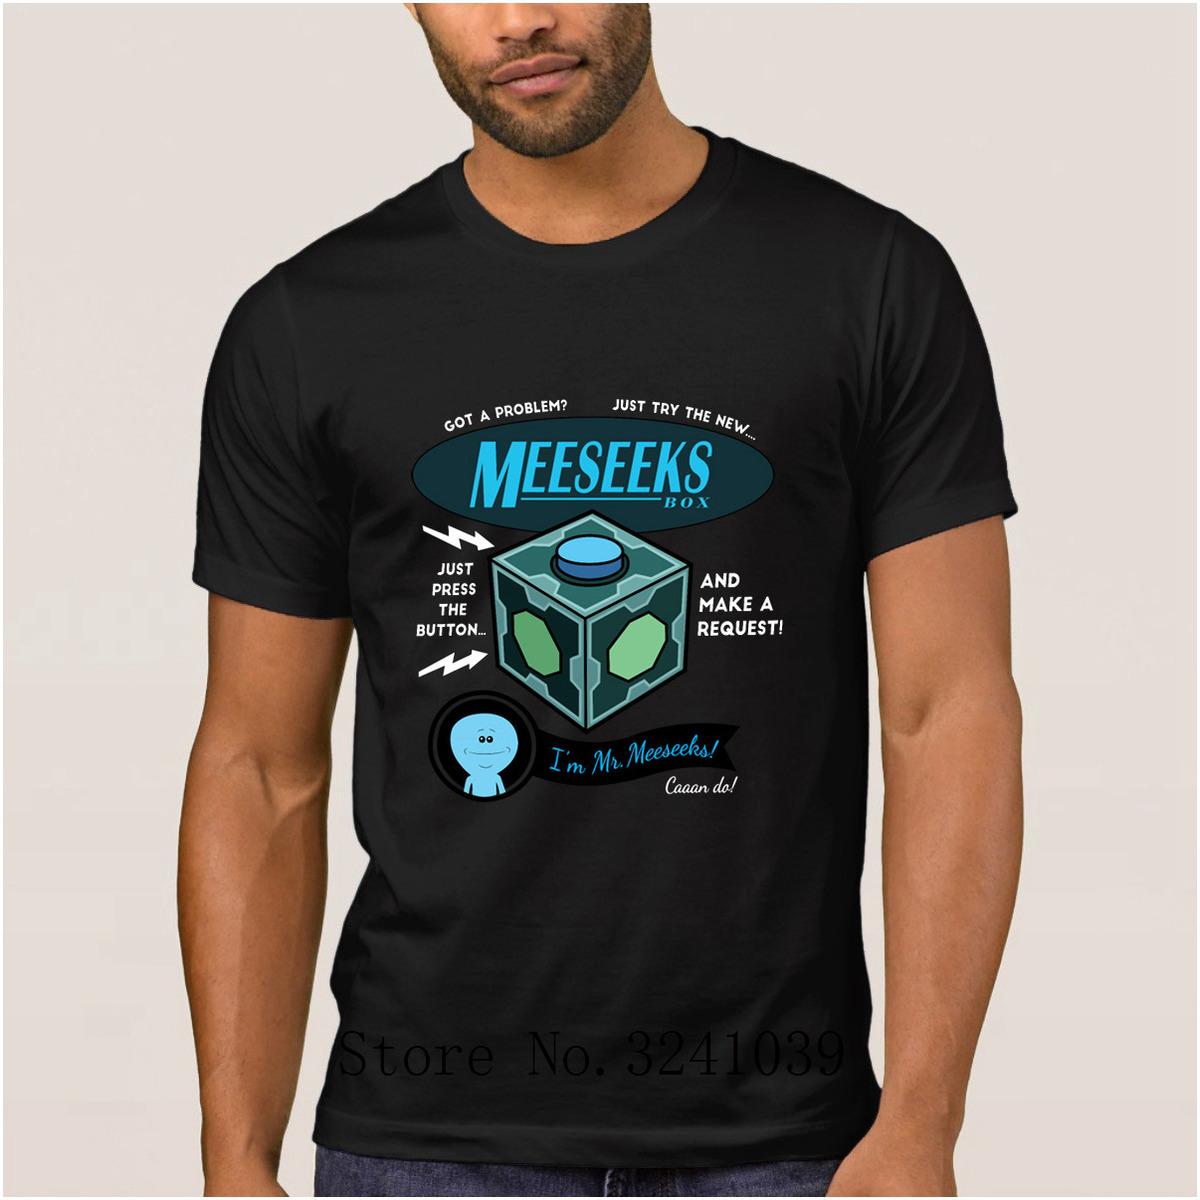 La Maxpa Character Humor Meeseeks Box T Shirt Sommer Günstige Pickle Rick Soft T-Shirt Mann Familie regelmäßige Tshirt für Männer